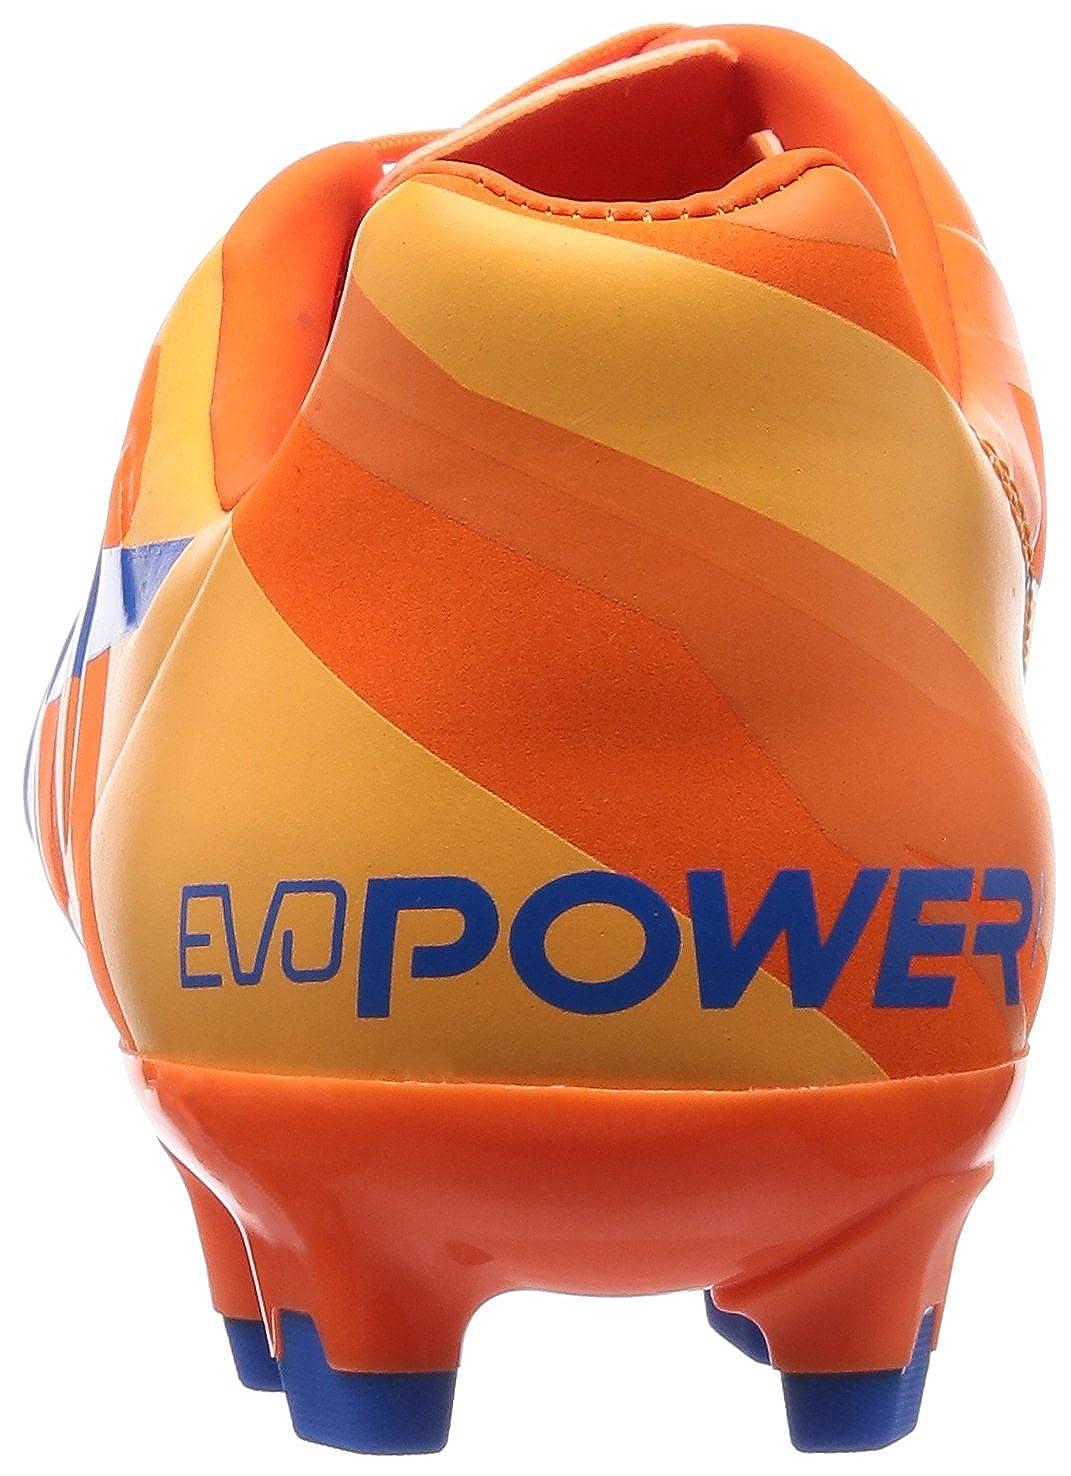 Puma Evopower 1 H2H FG 'Head To Head' Fussballschuhe Tricks Tricks Tricks Graphic Kollektion  4ac59e